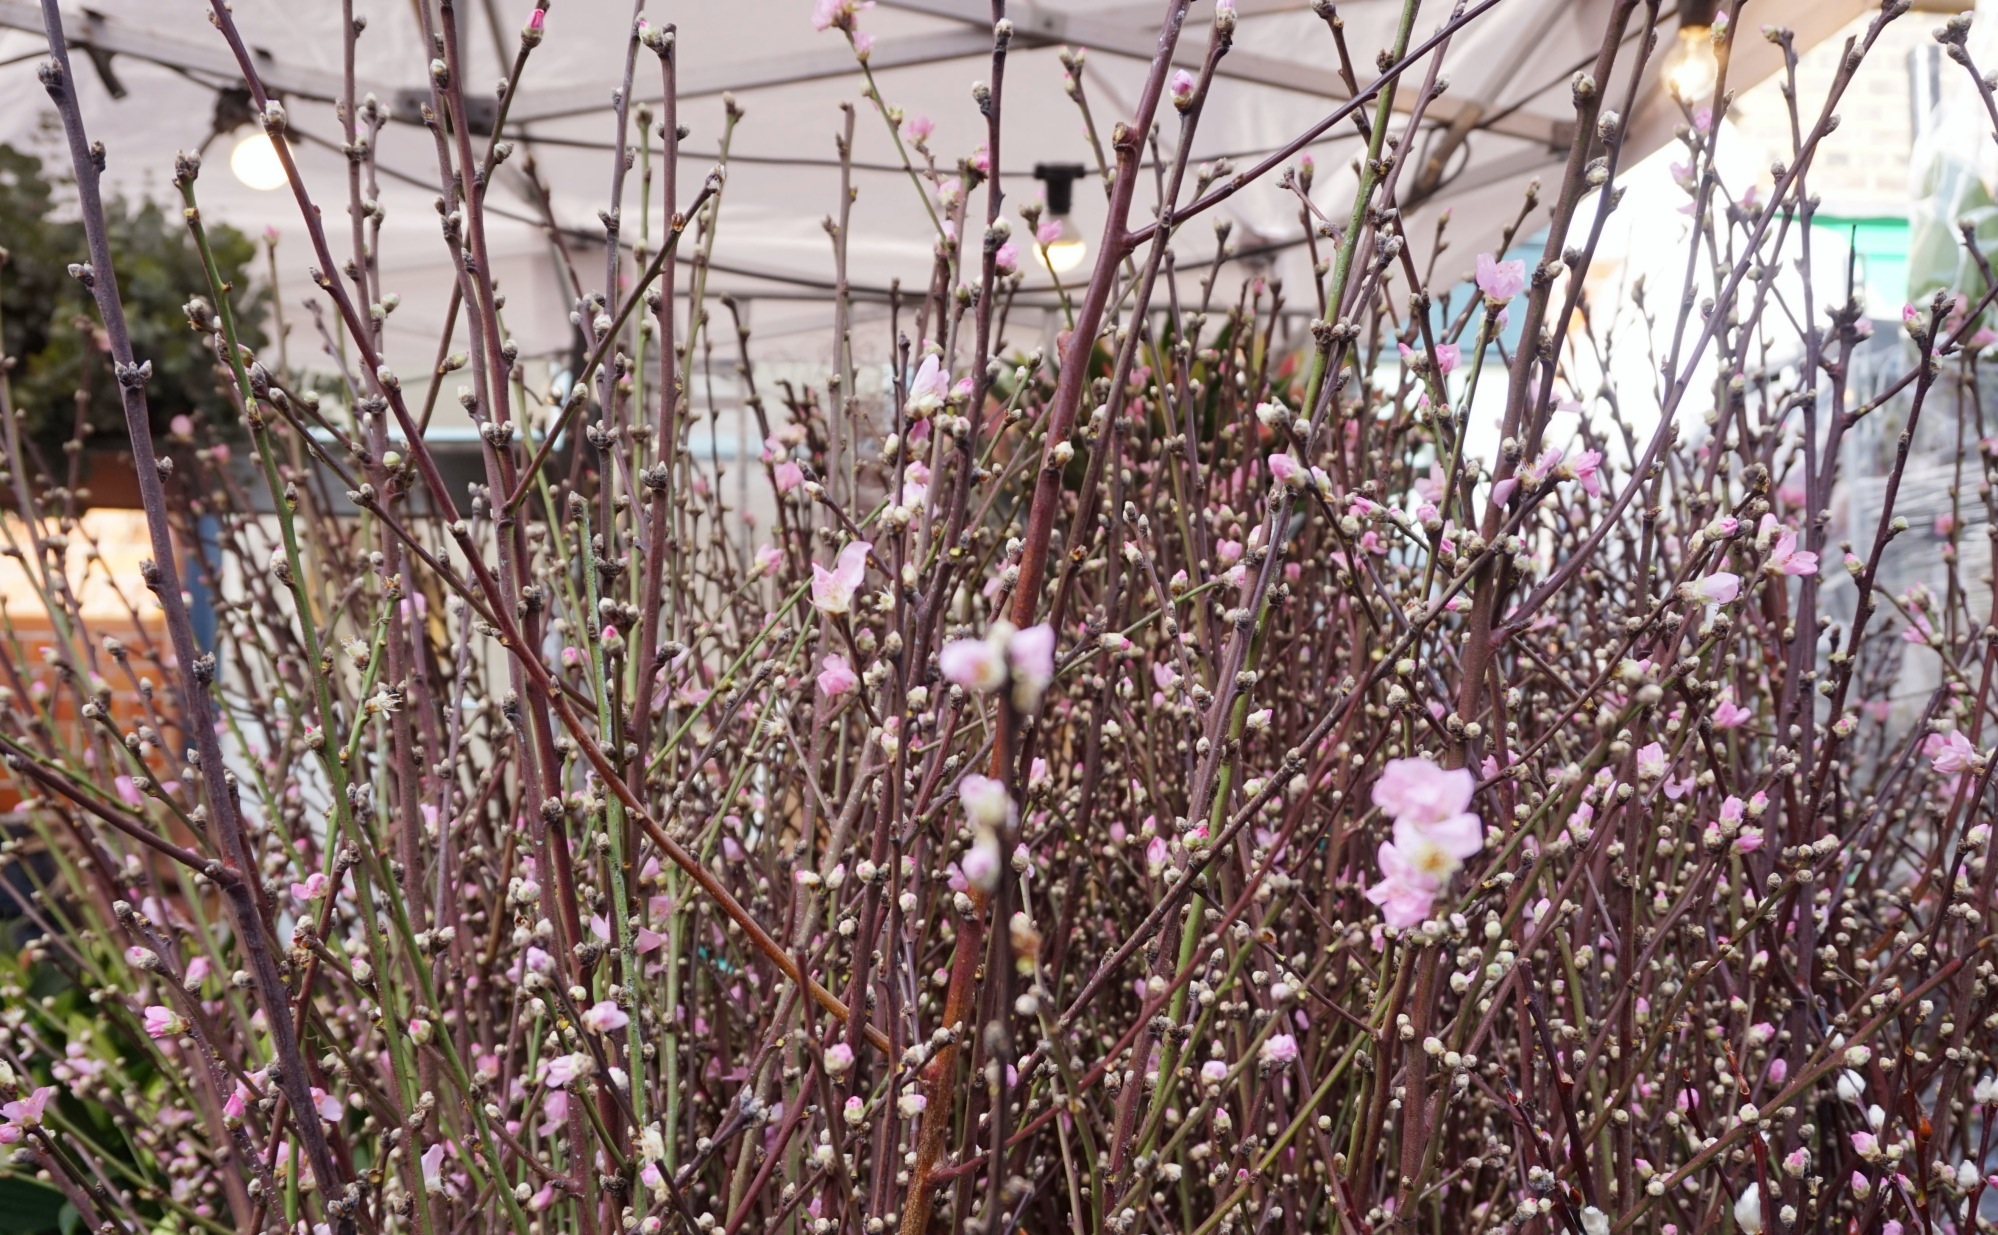 Balade-Columbia-Road-Flower-Market-13